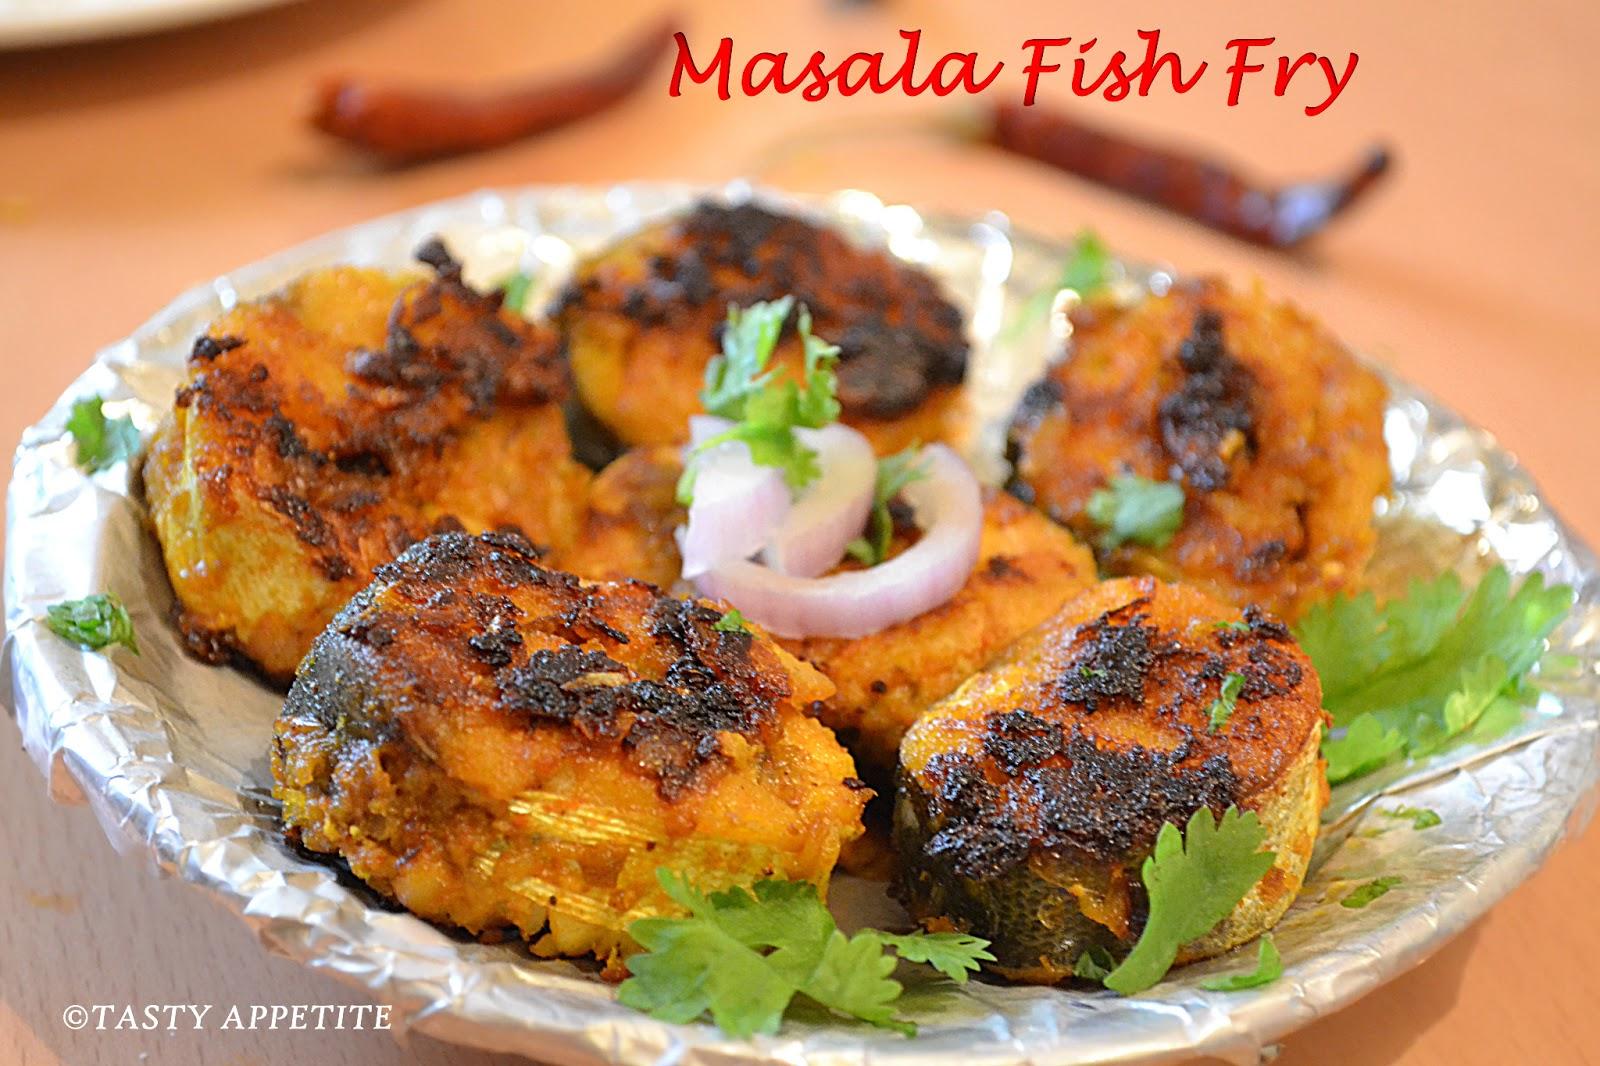 How To Make Masala Fish Fry South Indian Fish Fry Recipe